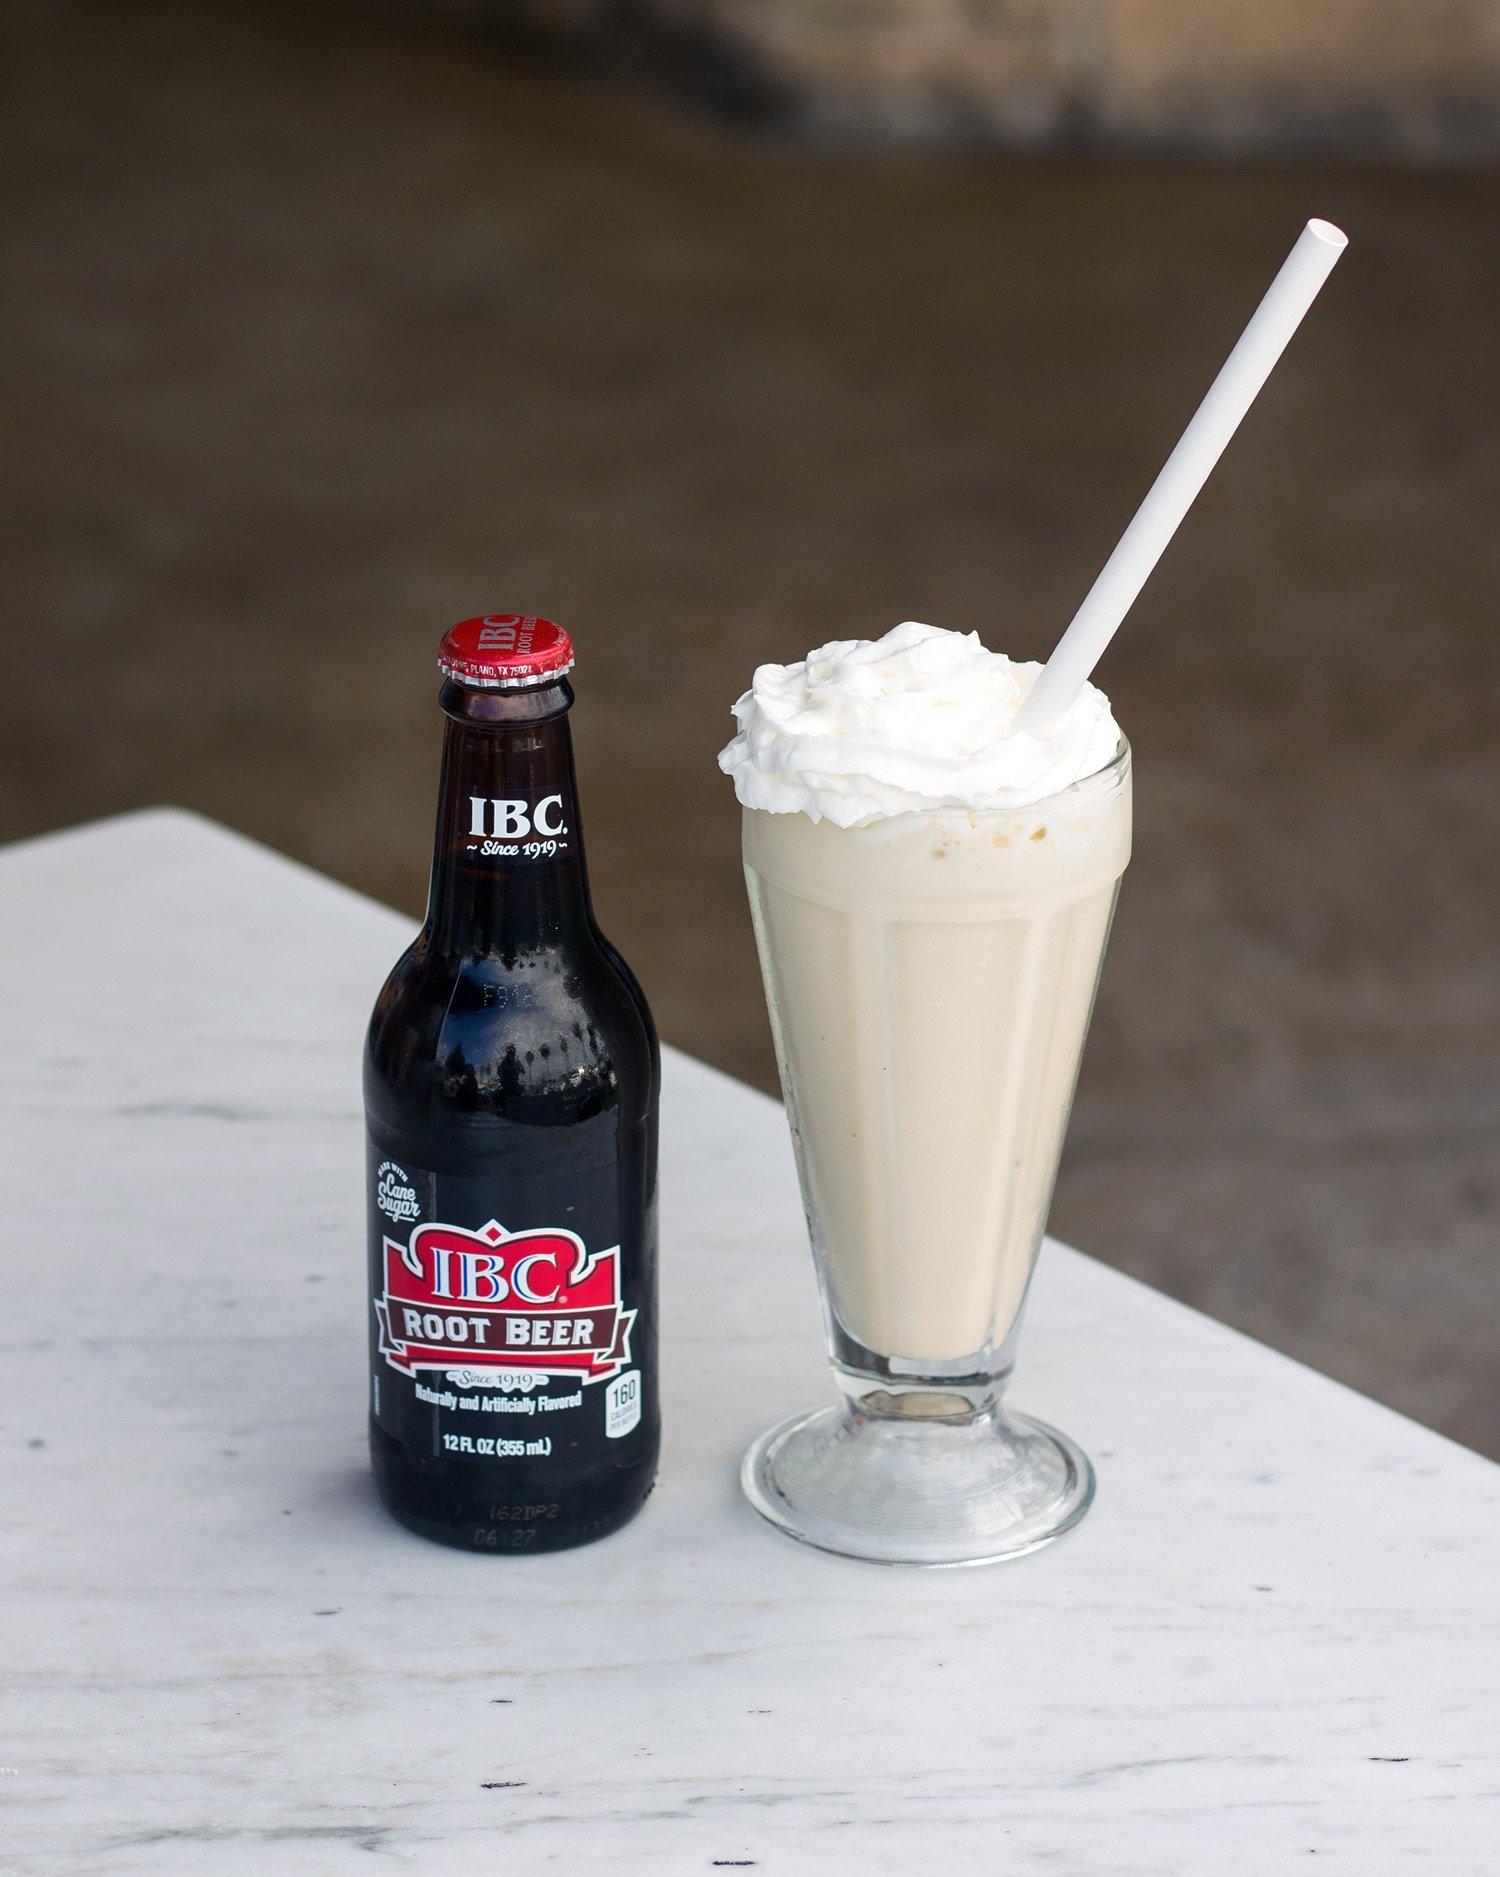 The Root Beer Milkshake from Harry's Coffee Shop